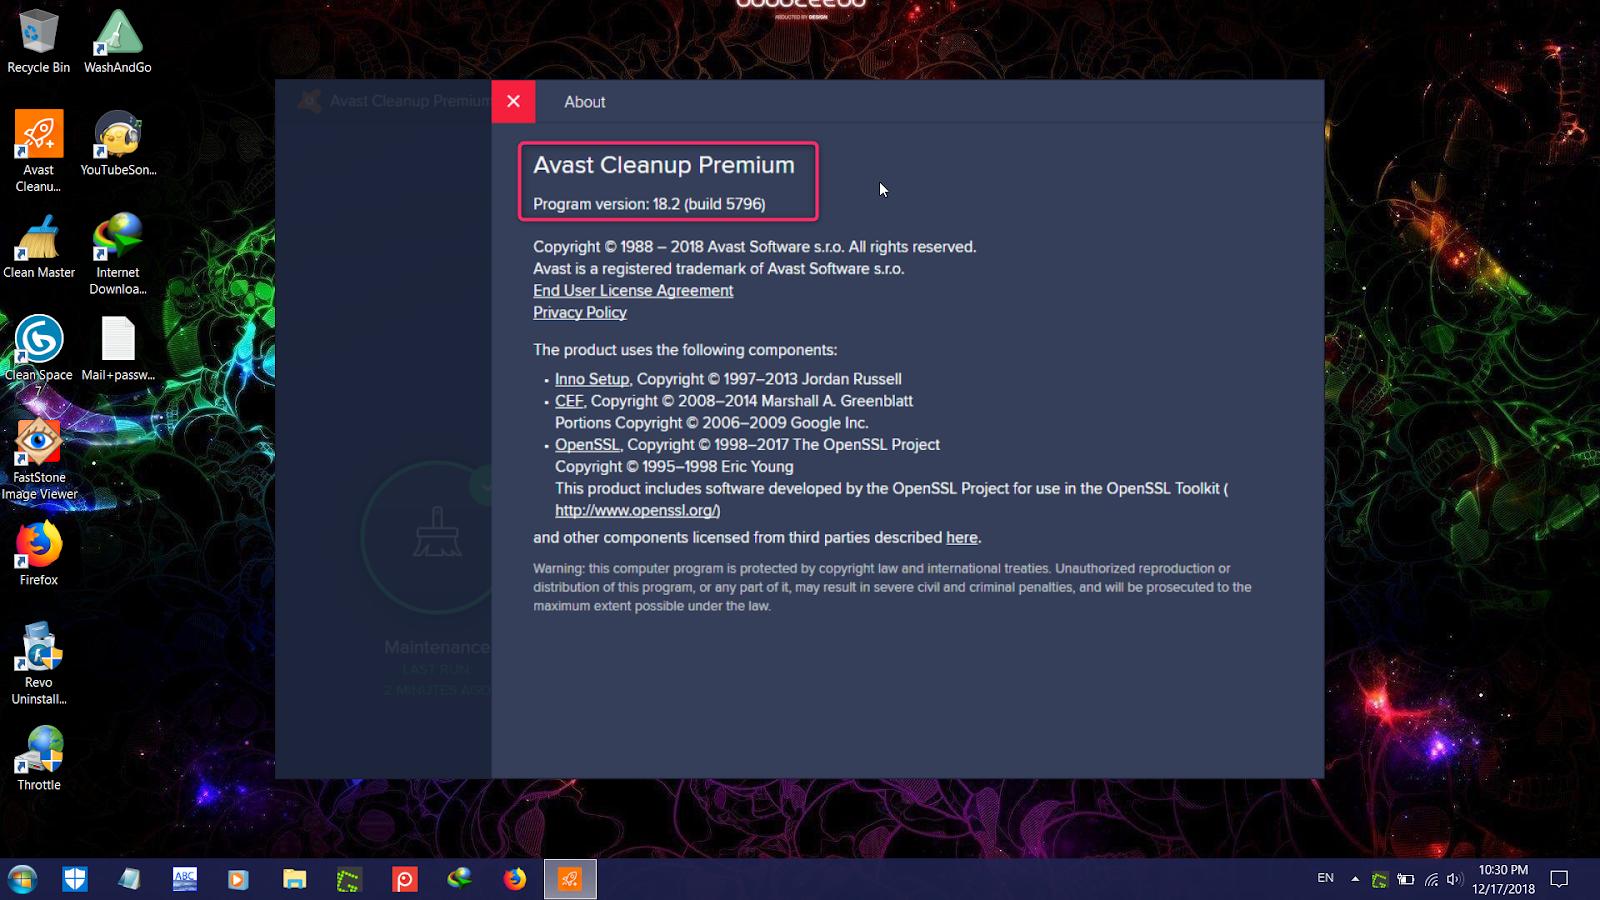 avast cleanup premium trial key